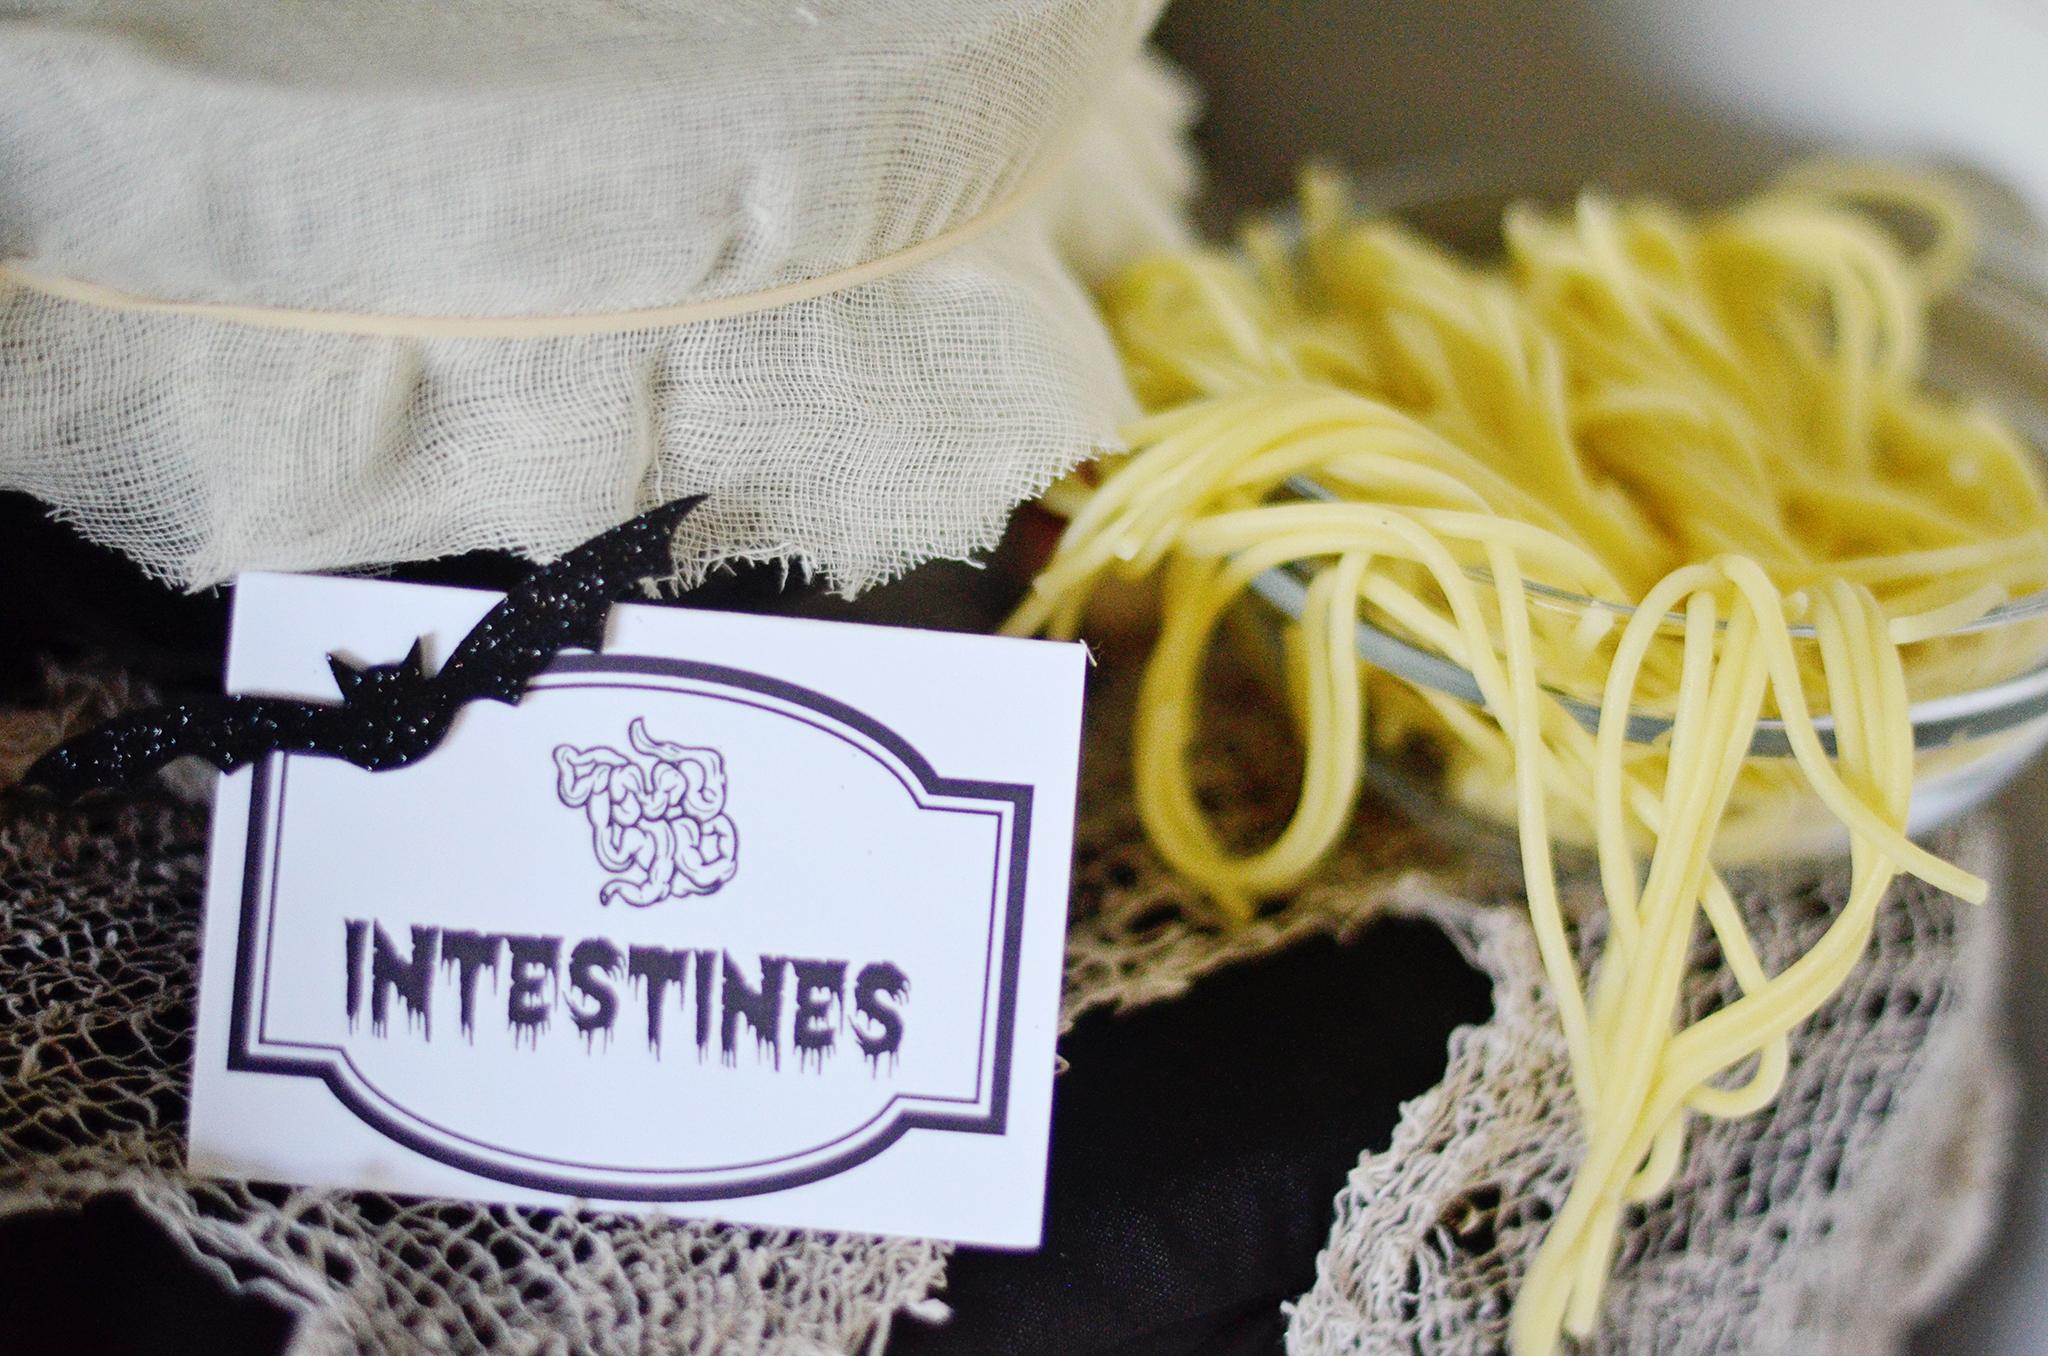 Intestines! Cooked Spaghetti